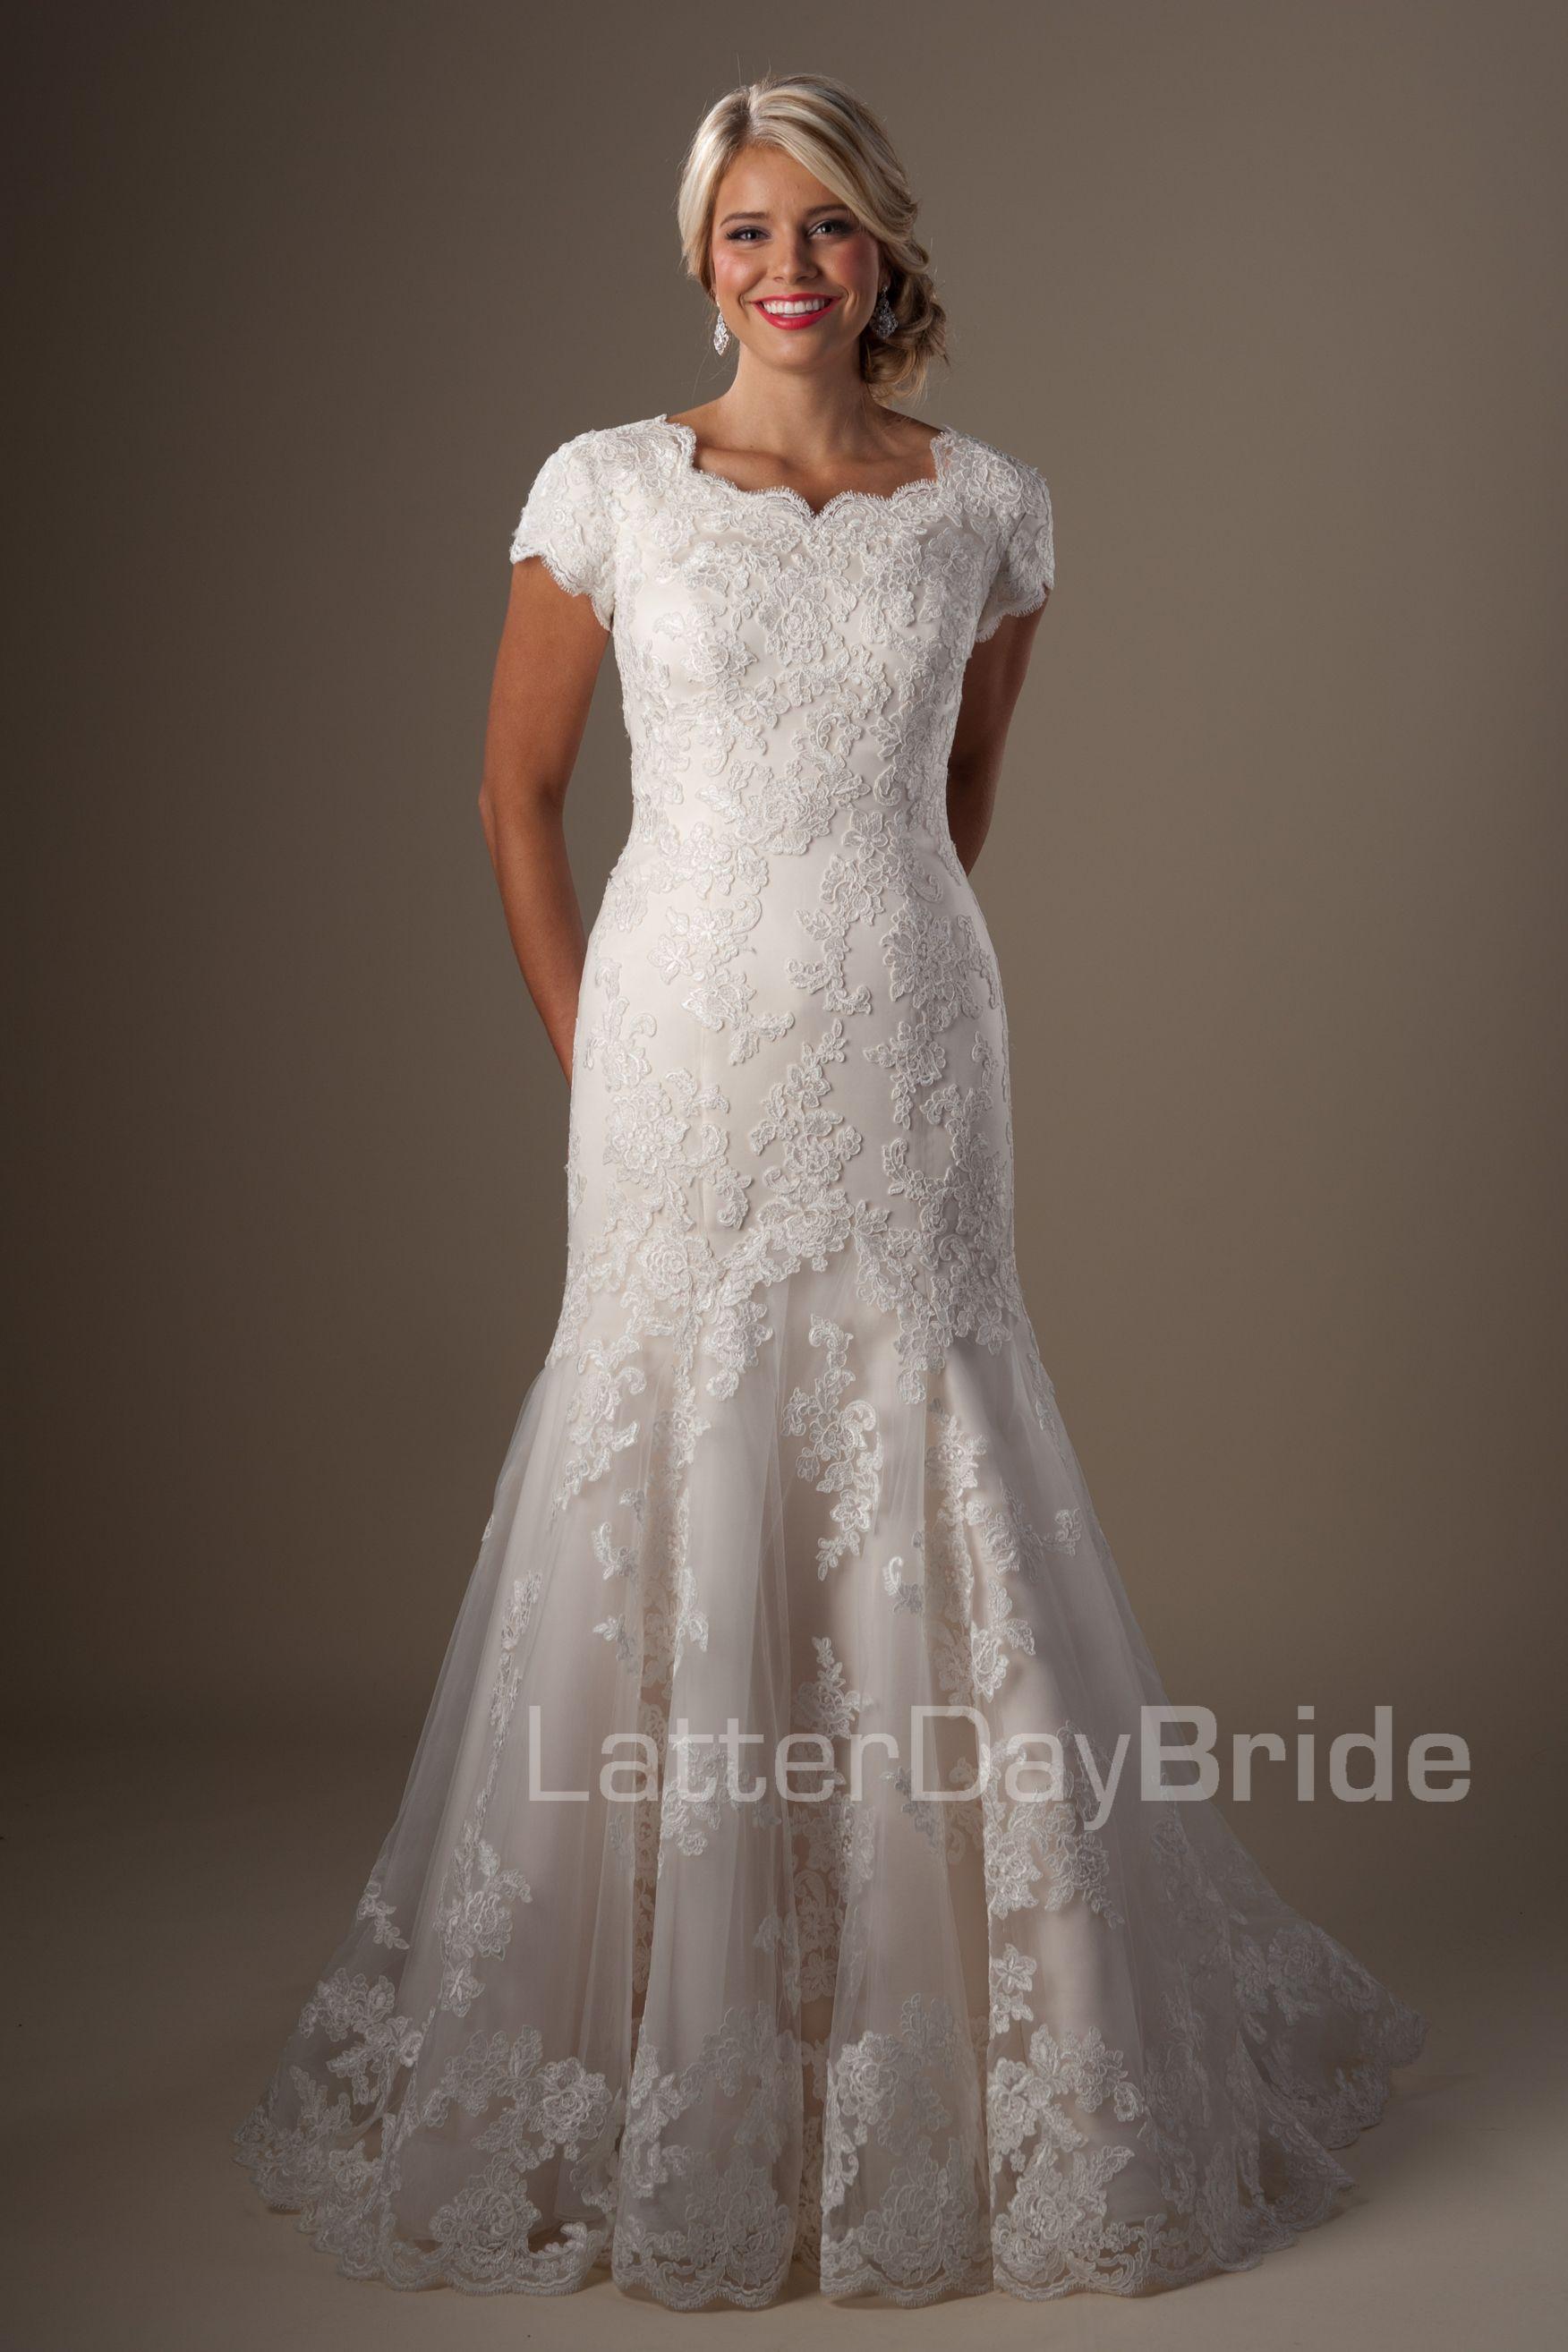 Modest Wedding Dresses Perrier Plus Wedding Dresses Modest Wedding Dresses Modest Dresses [ 2628 x 1752 Pixel ]